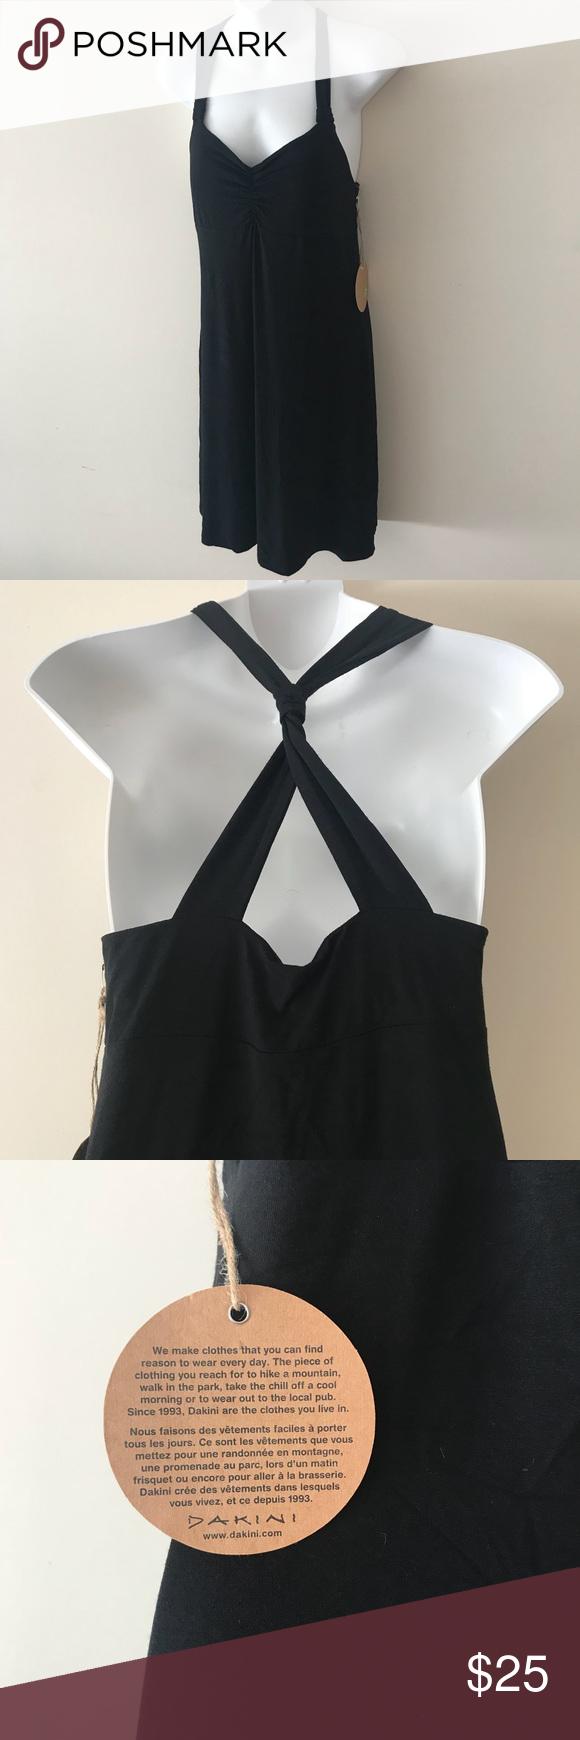 Dakini Black Stretchy Summer Dress W Built In Bra Fashion Clothes Design Fashion Design [ 1740 x 580 Pixel ]